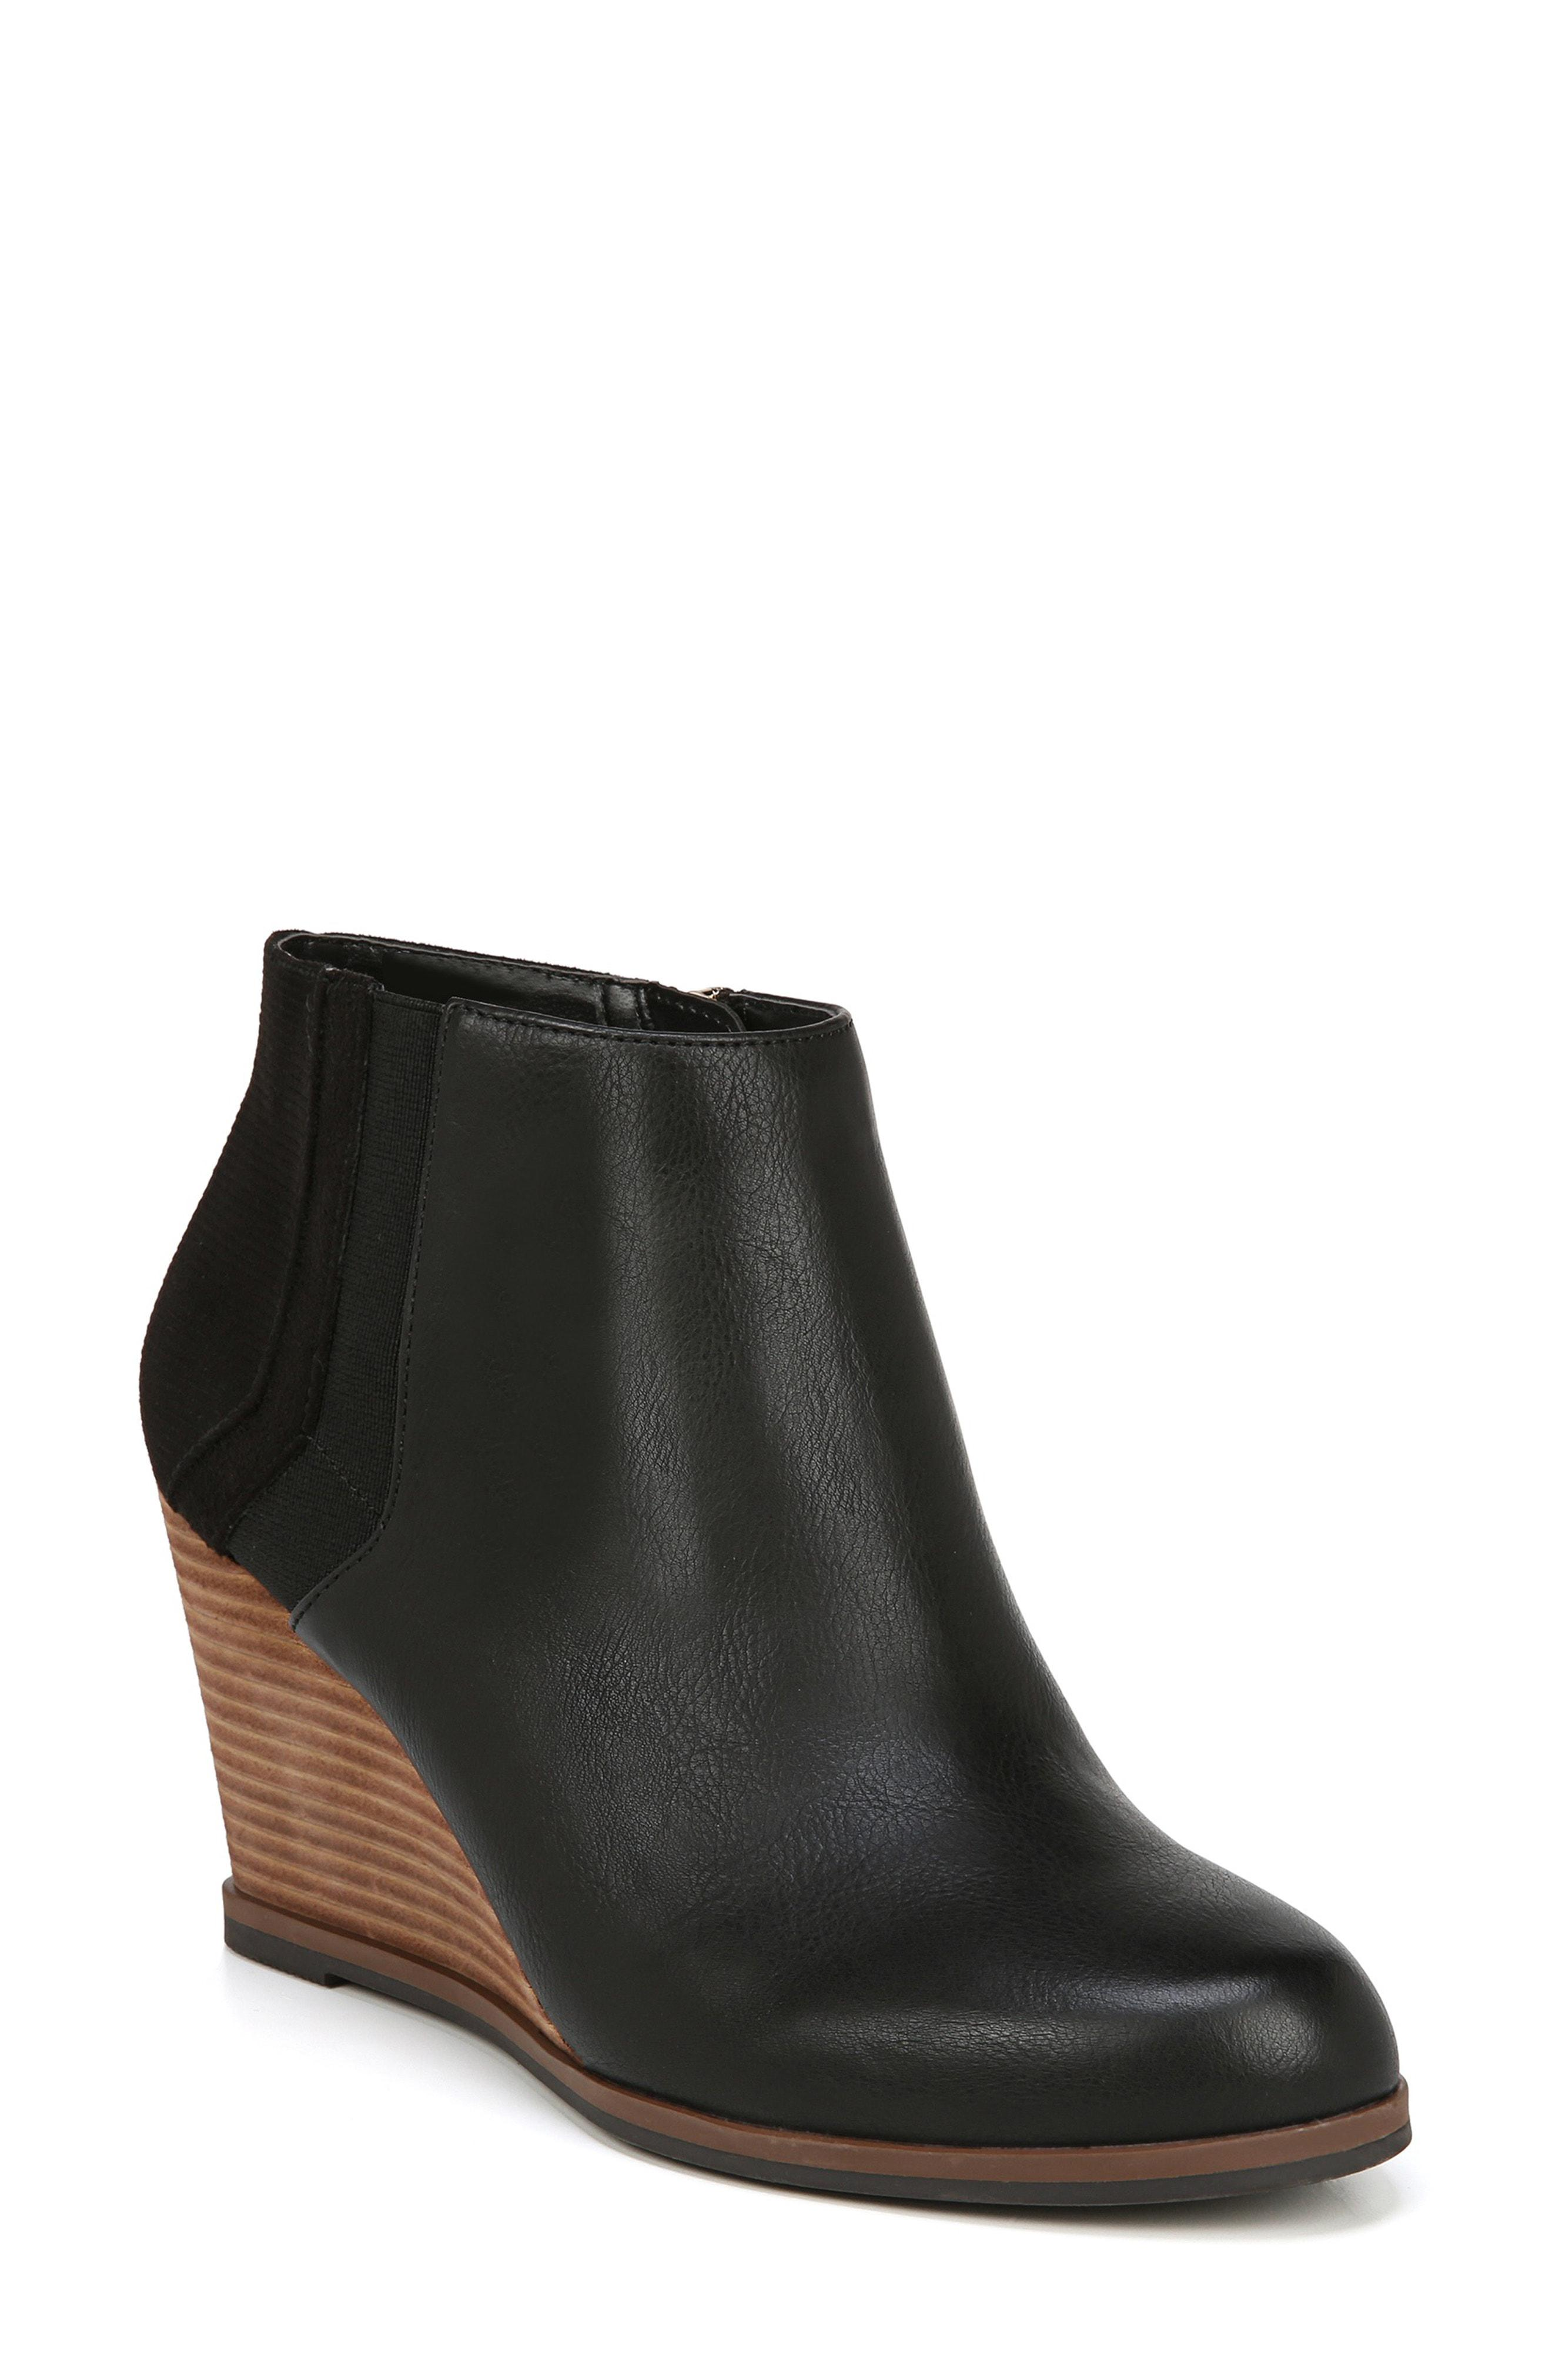 b0b5430dca18 Lyst - Dr. Scholls Patch (copper Brown) Women s Shoes in Black ...